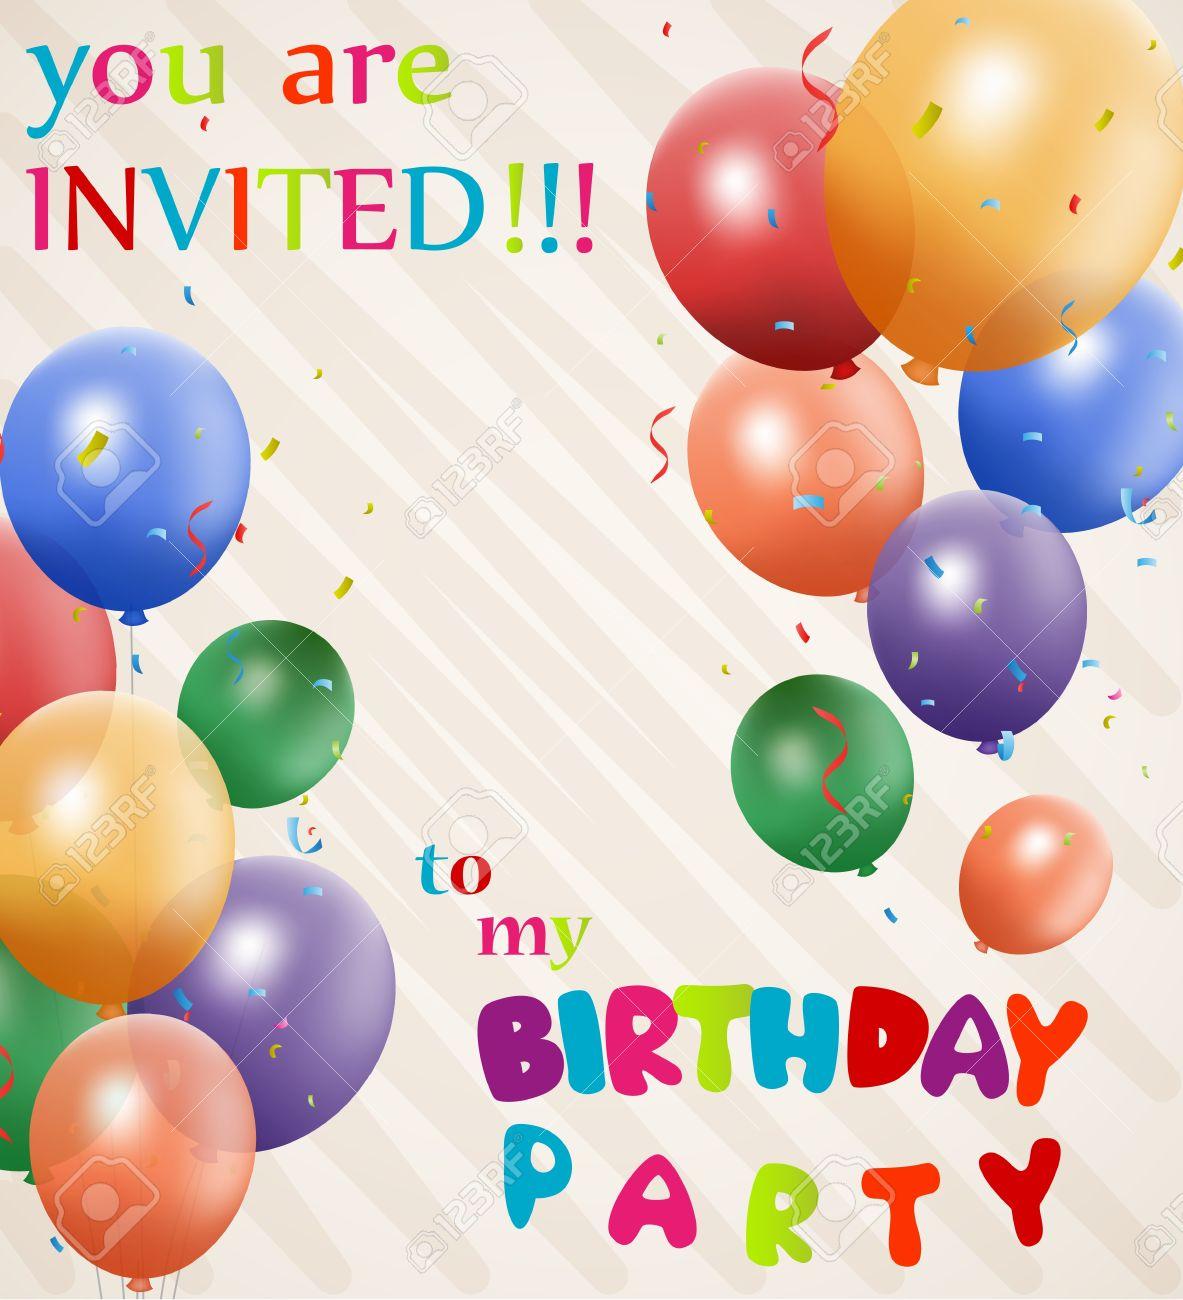 Birthday Invitation Background Royalty Free Cliparts Vectors And - Birthday invitation background vector